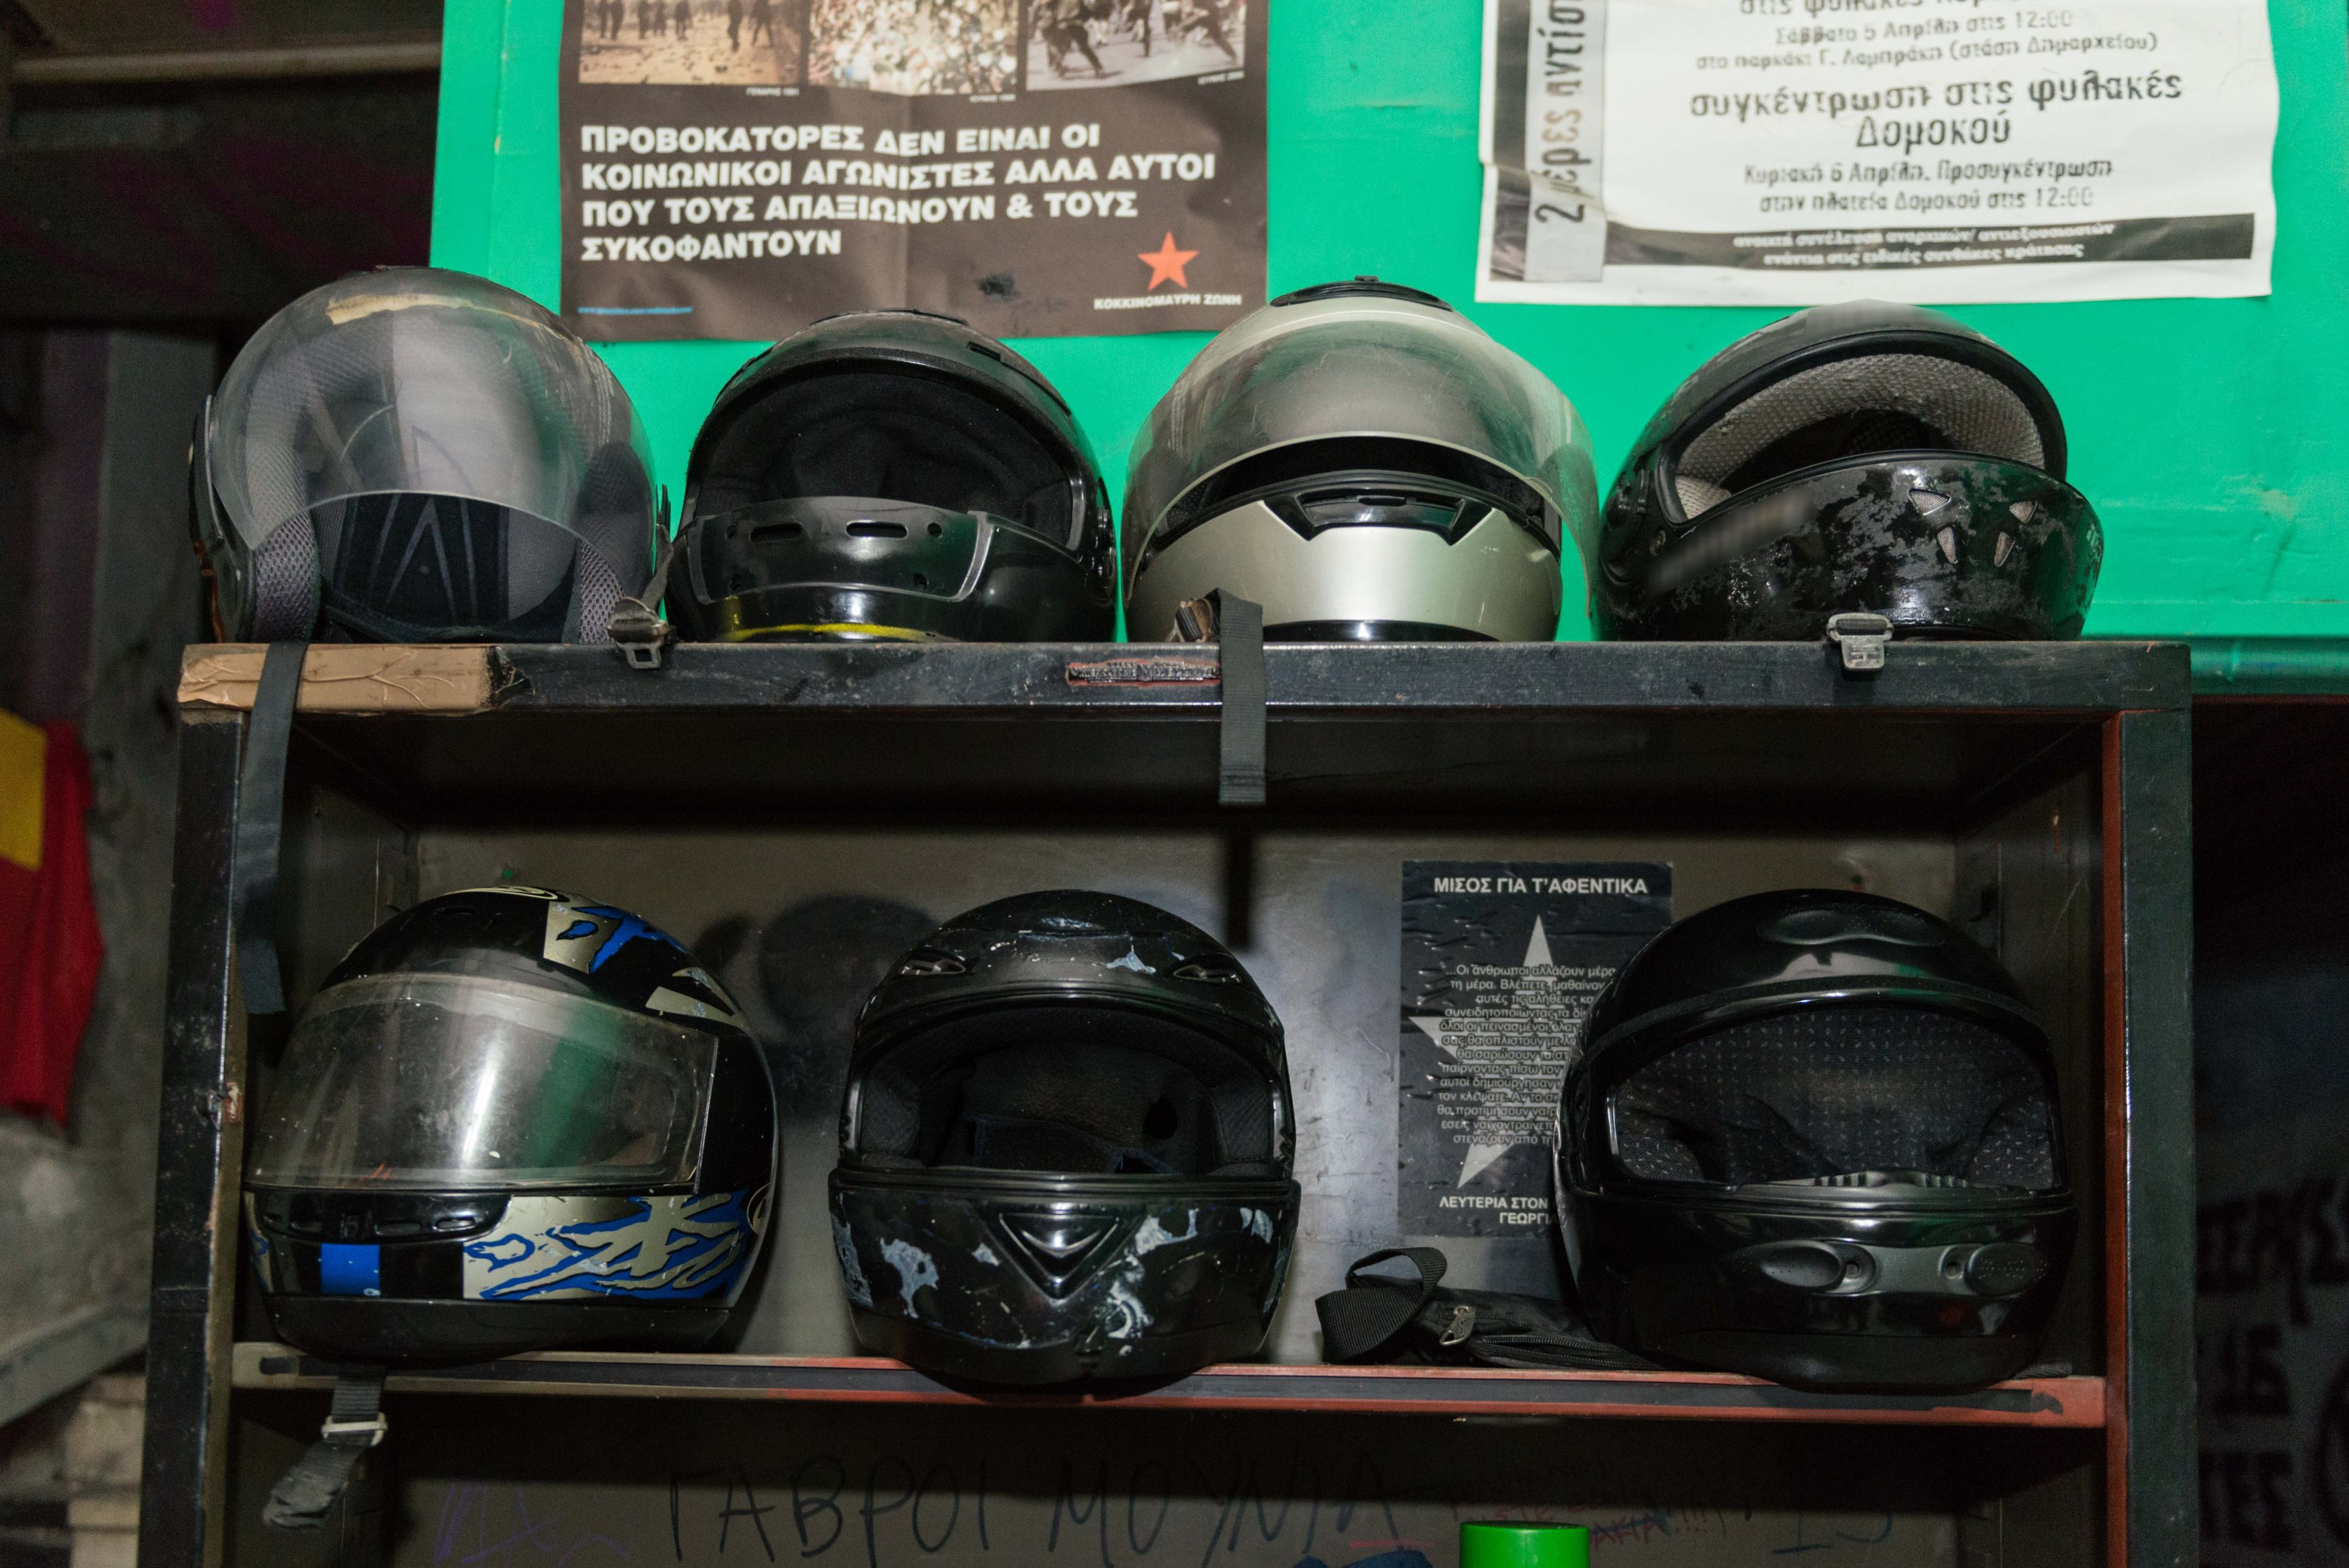 Kοντάρια, κράνη, γάντια, κουκούλες, ρούχα αμφίεσης και πυροσβεστήρες στη «γιάφκα» της ΑΣΟΕΕ...